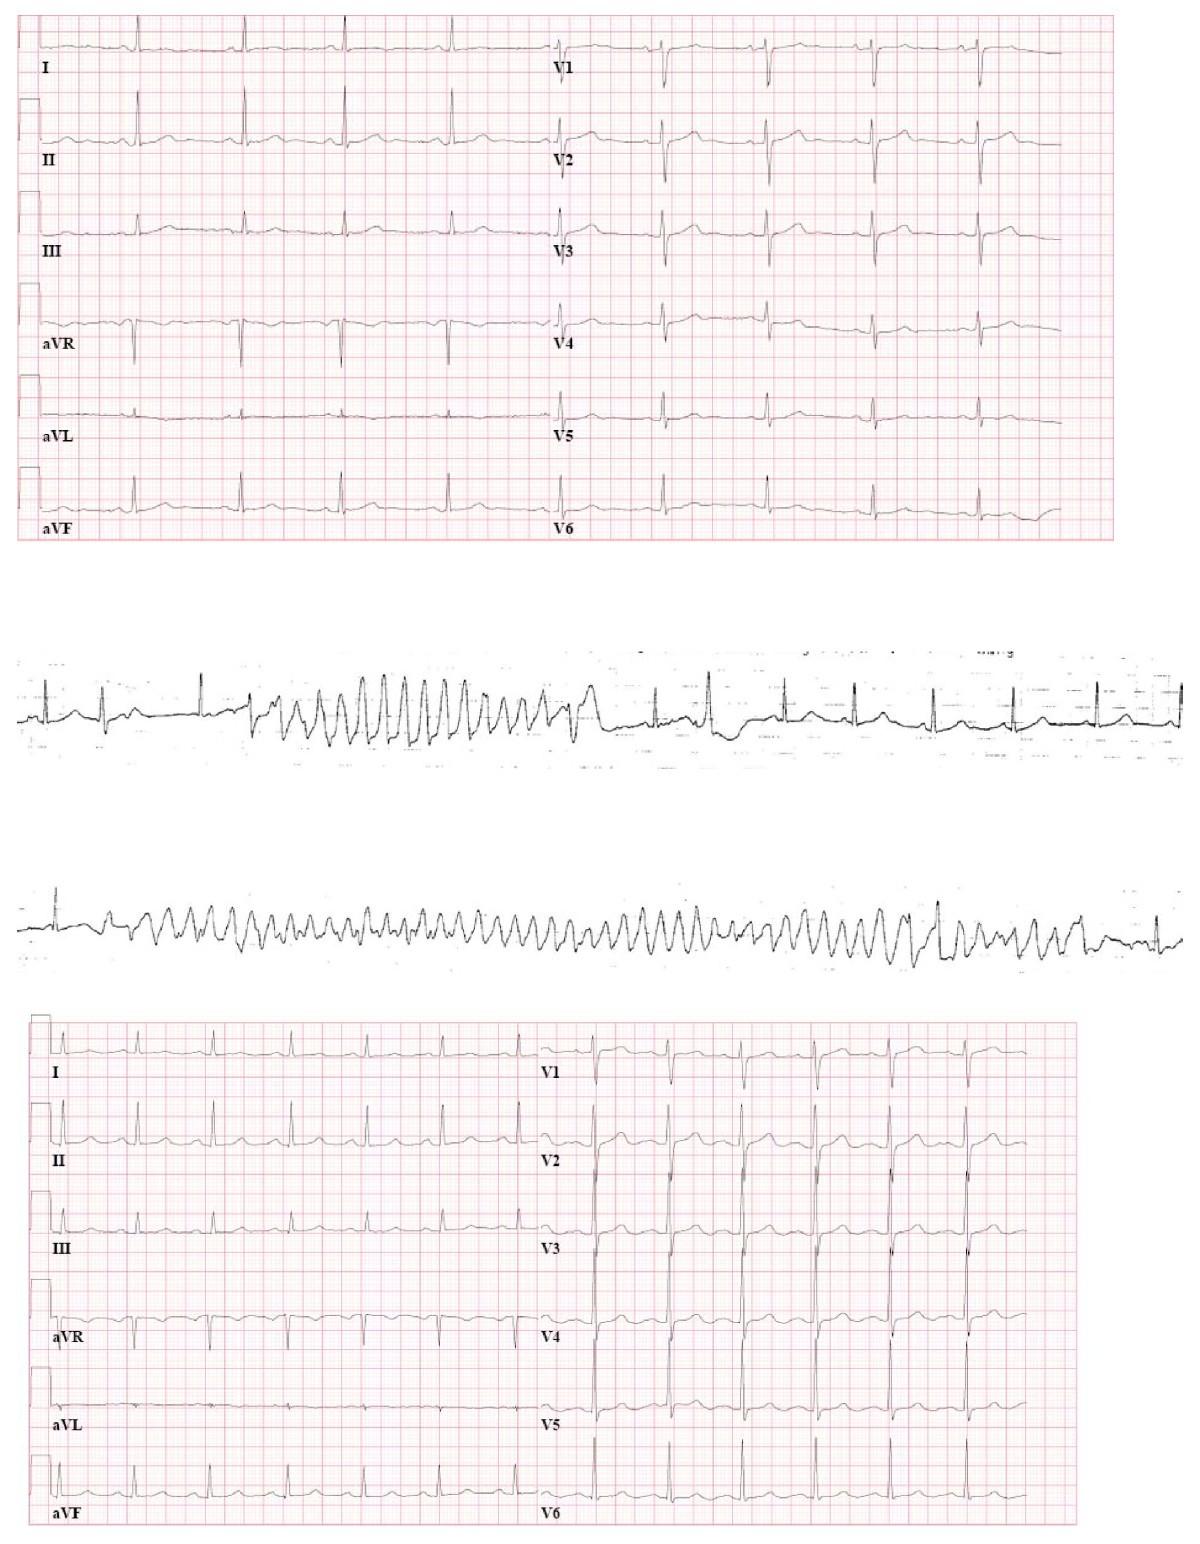 Torsades de pointes during laparoscopic adrenalectomy of a